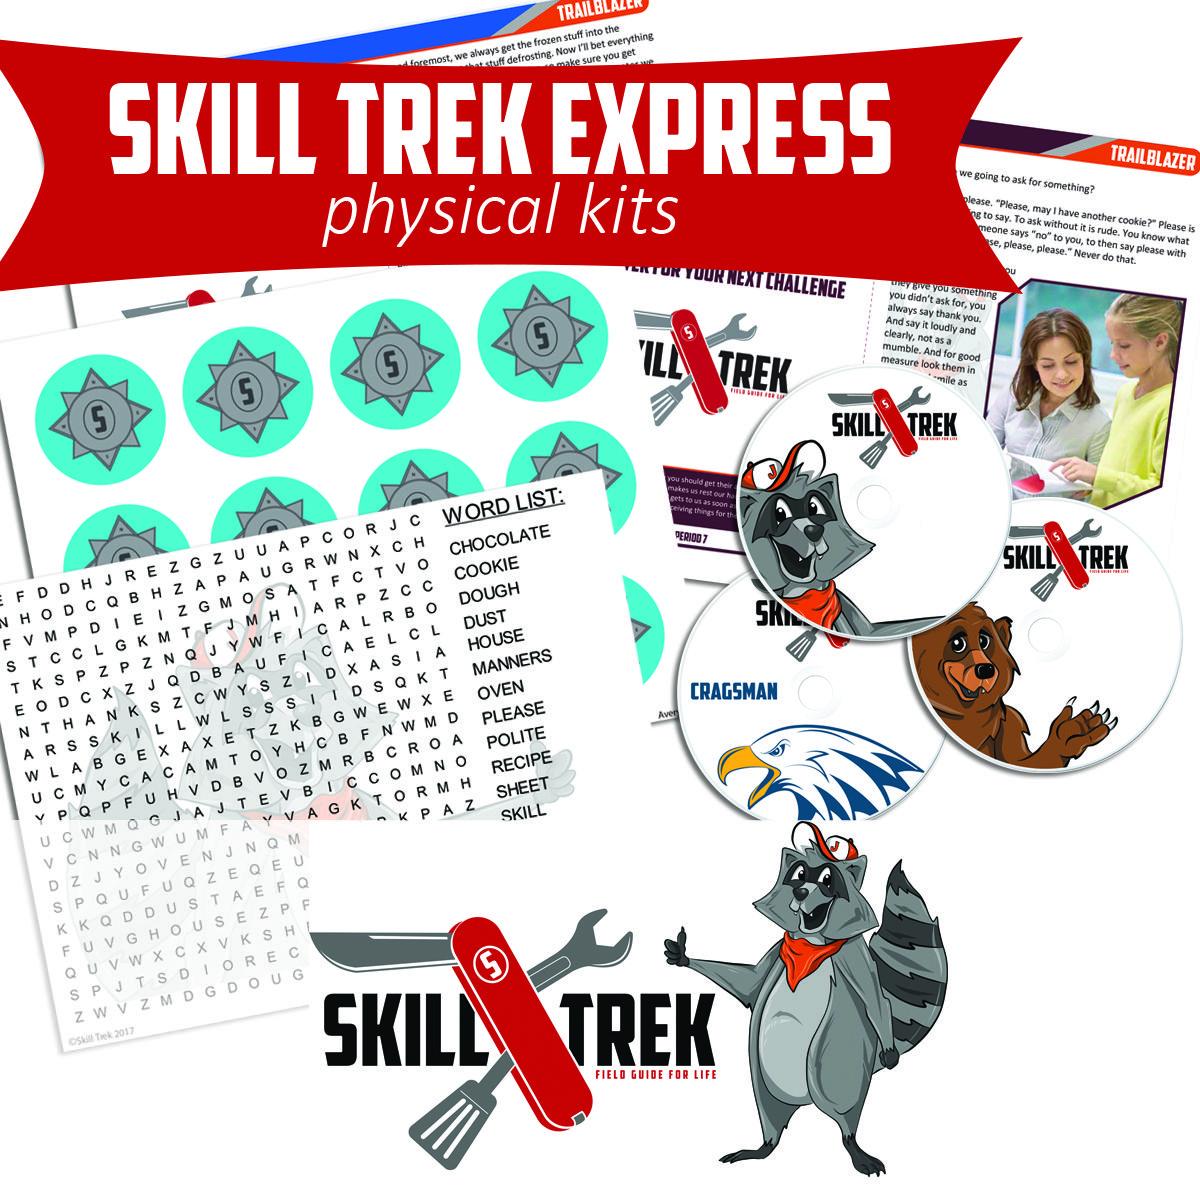 Skill Trek Express Physical Kits